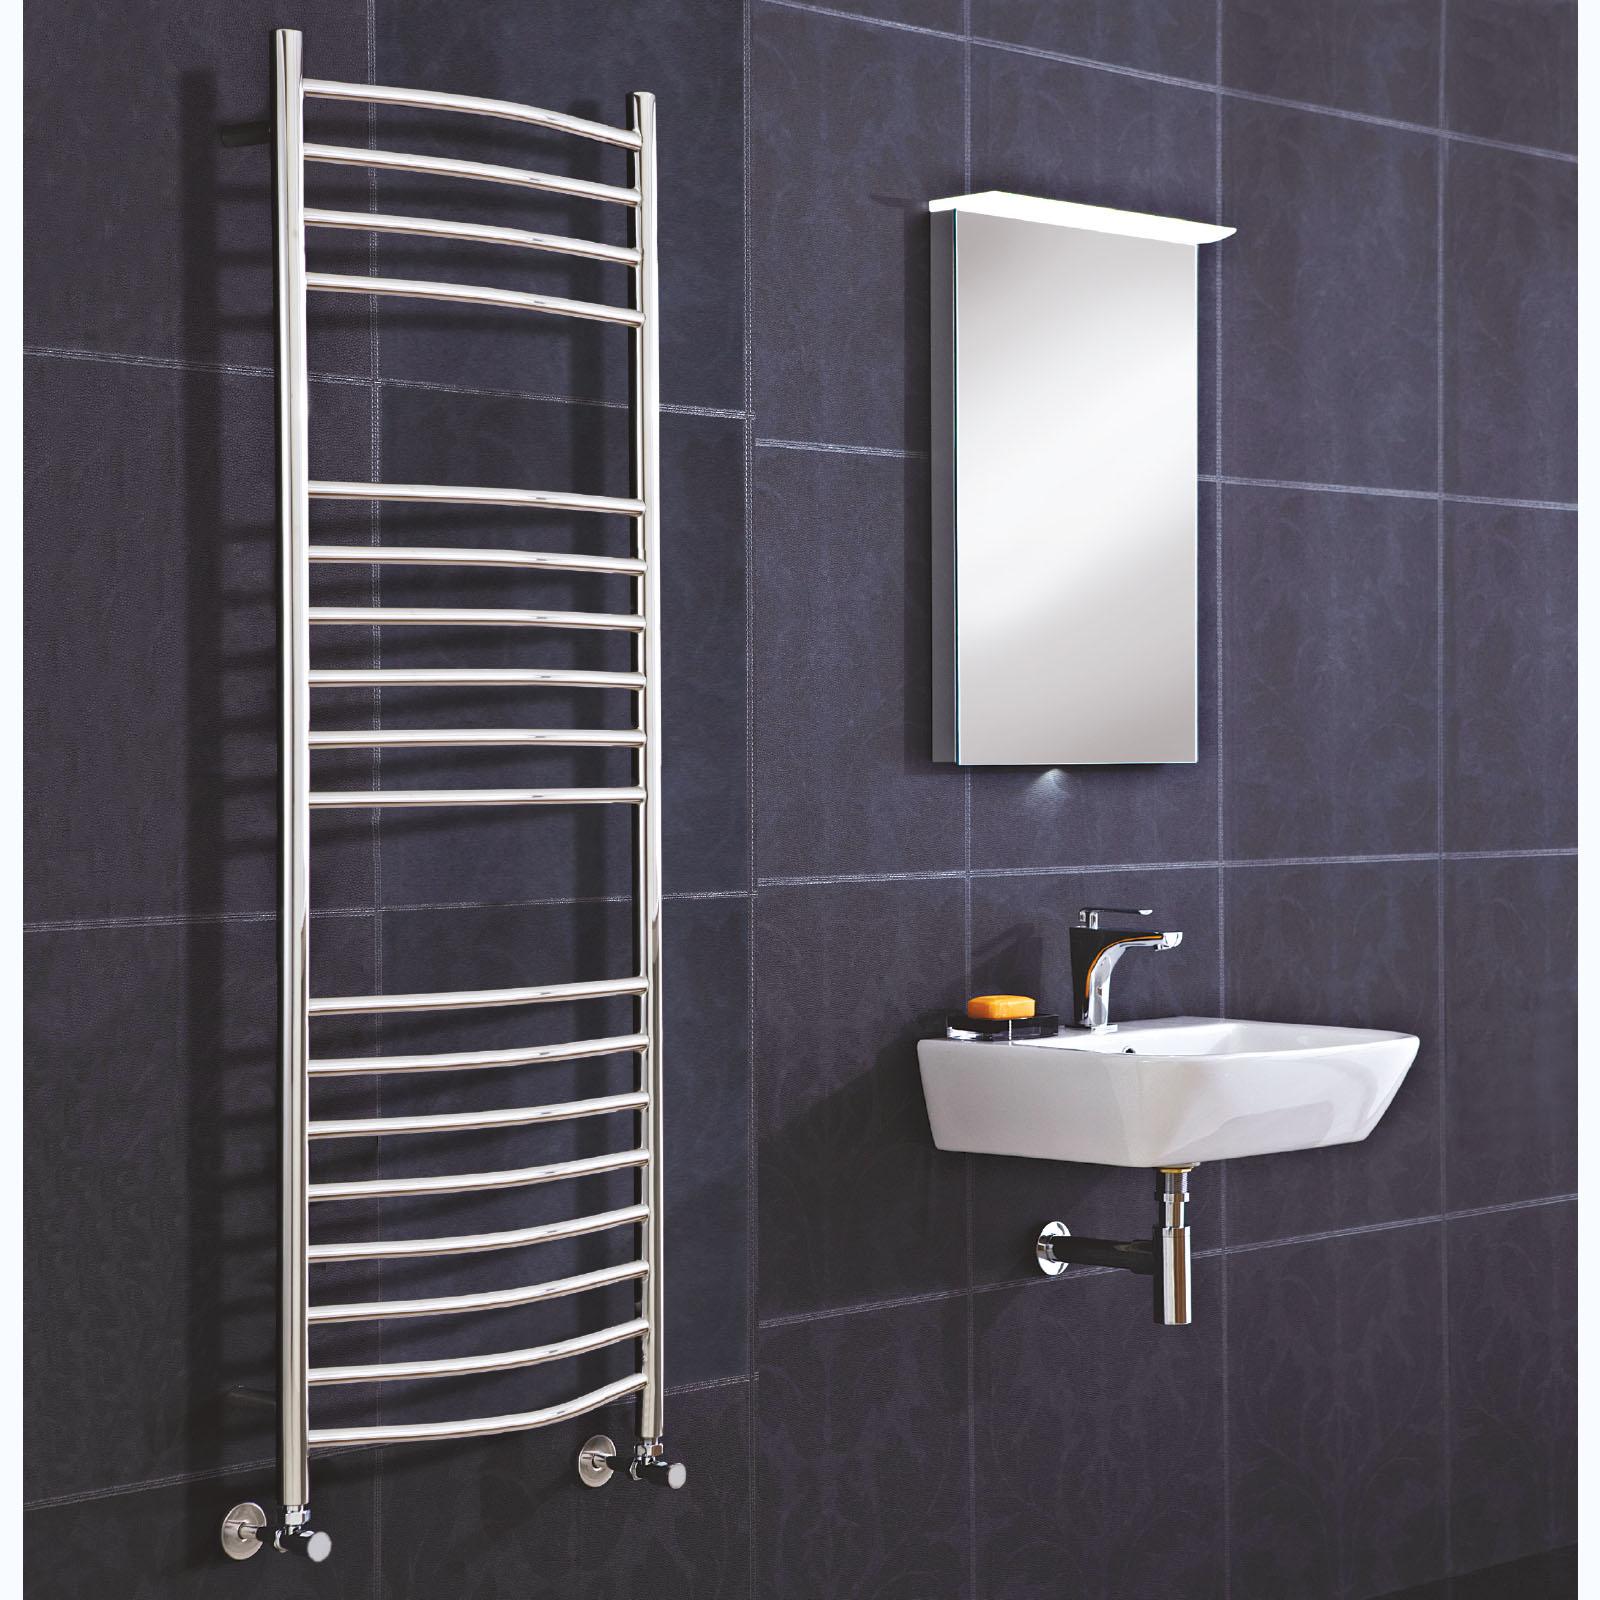 Phoenix Thame Curved Stainless Steel Bathroom Towel Radiators